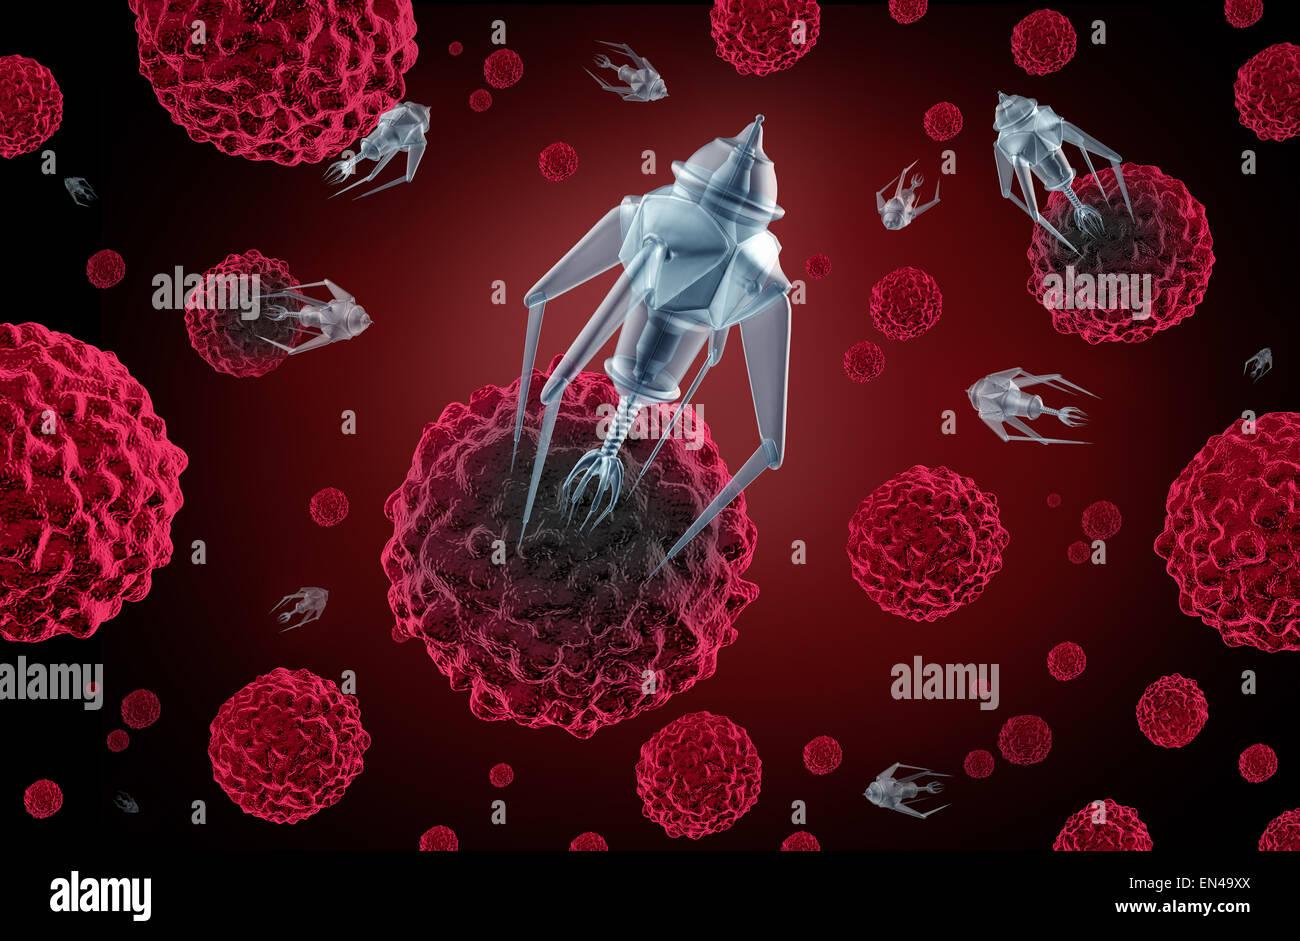 Nanotechnology medicine concept as a group of microscopic nano robots or nanobots programed to kill cancer cells - Stock Image